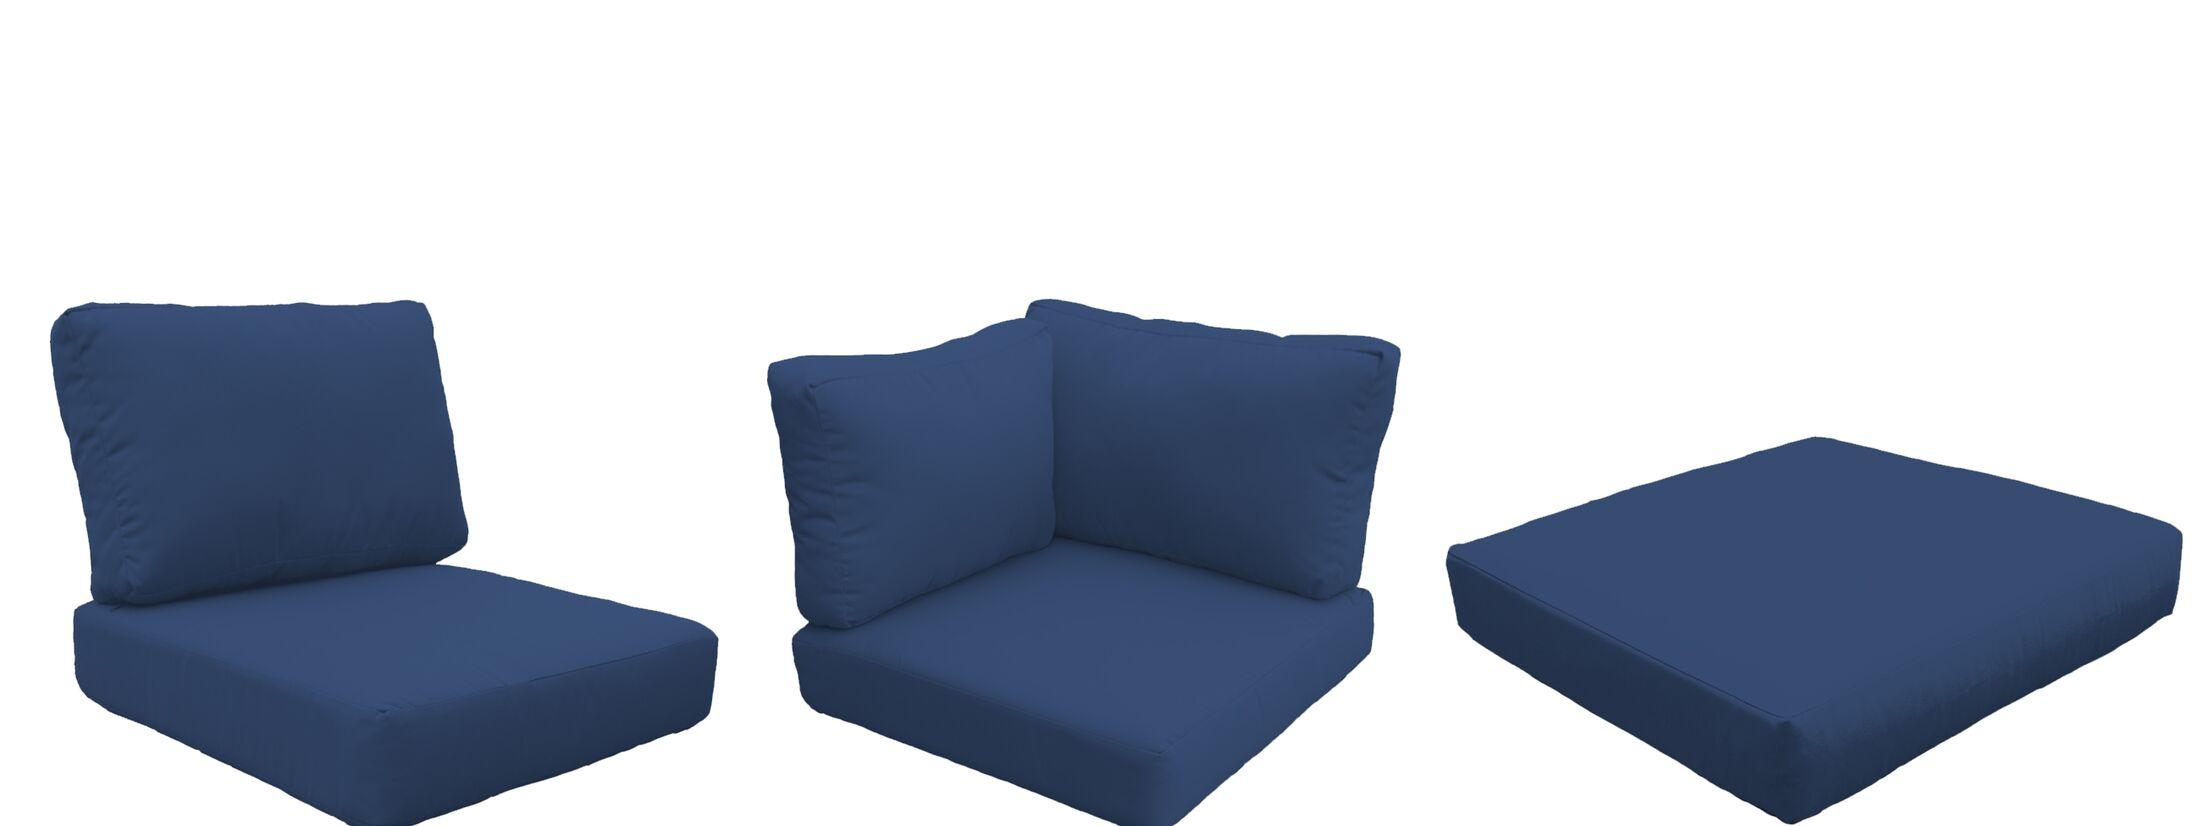 Barbados 22 Piece Outdoor Cushion Set Fabric: Navy